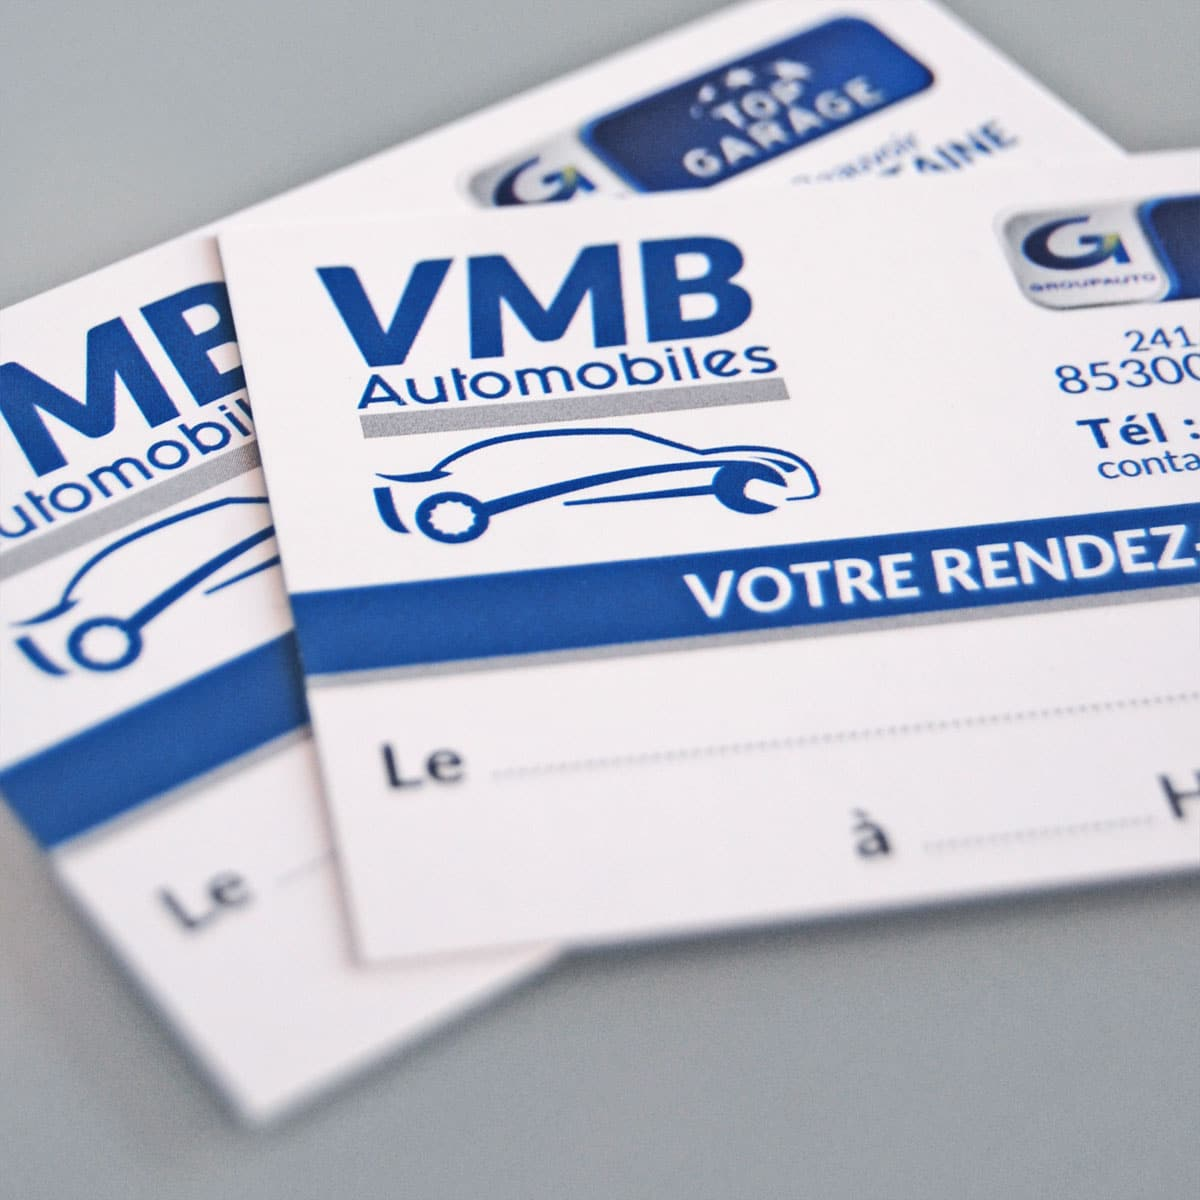 Carte de rendez-vous - VMB Automobiles - Sallertaine